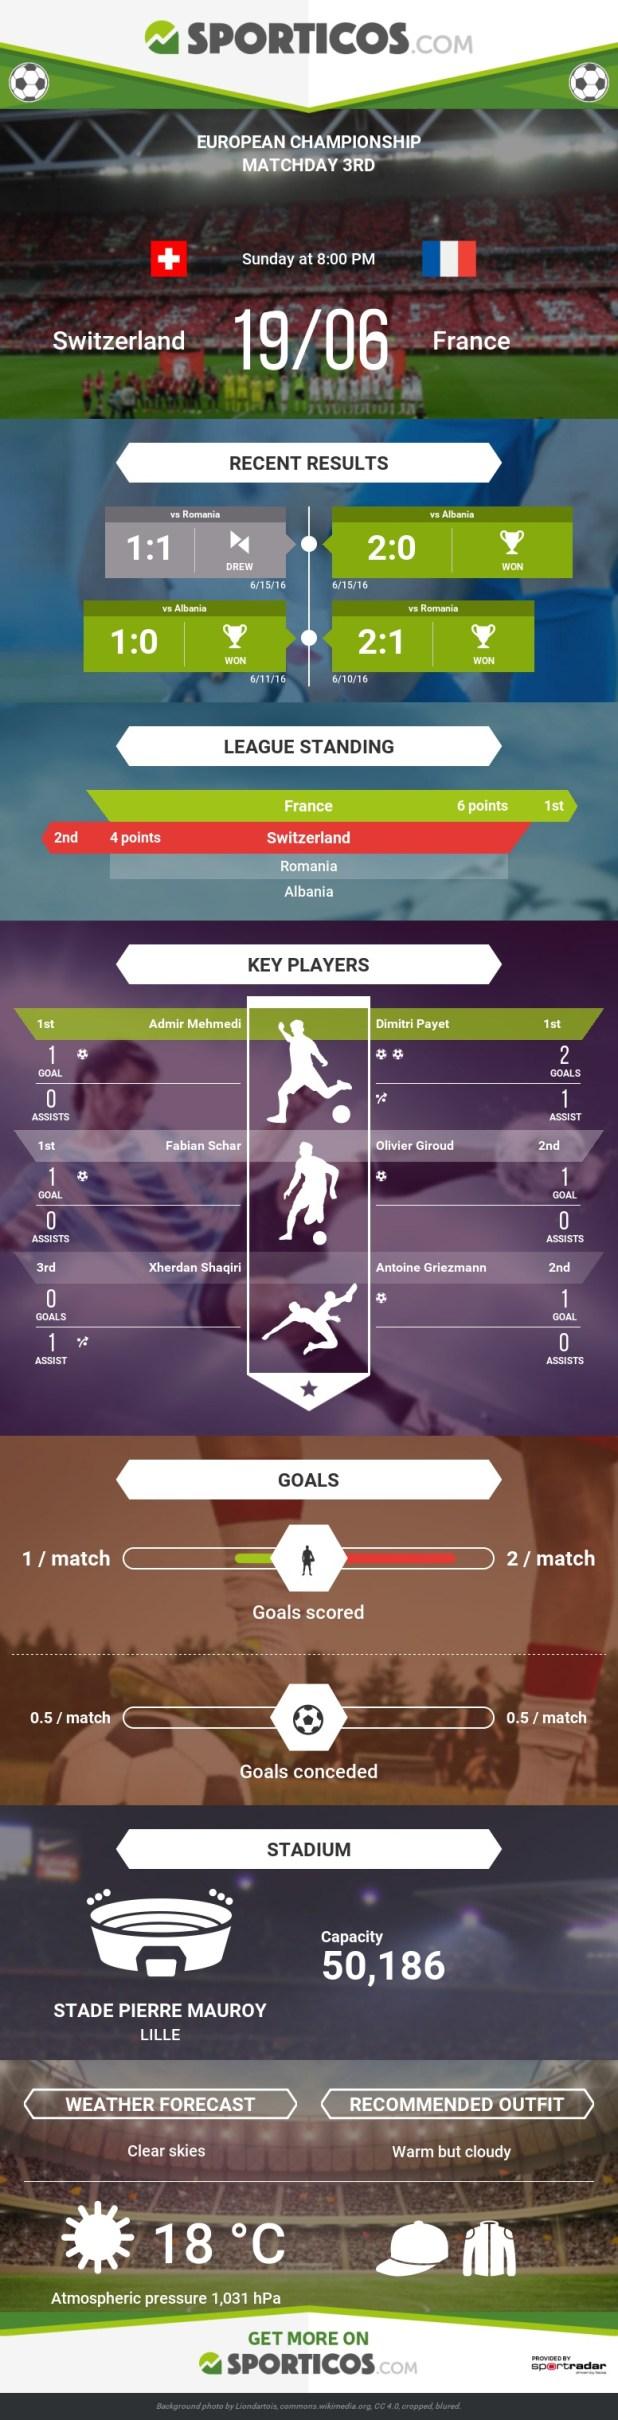 Sporticos_com_switzerland_vs_france